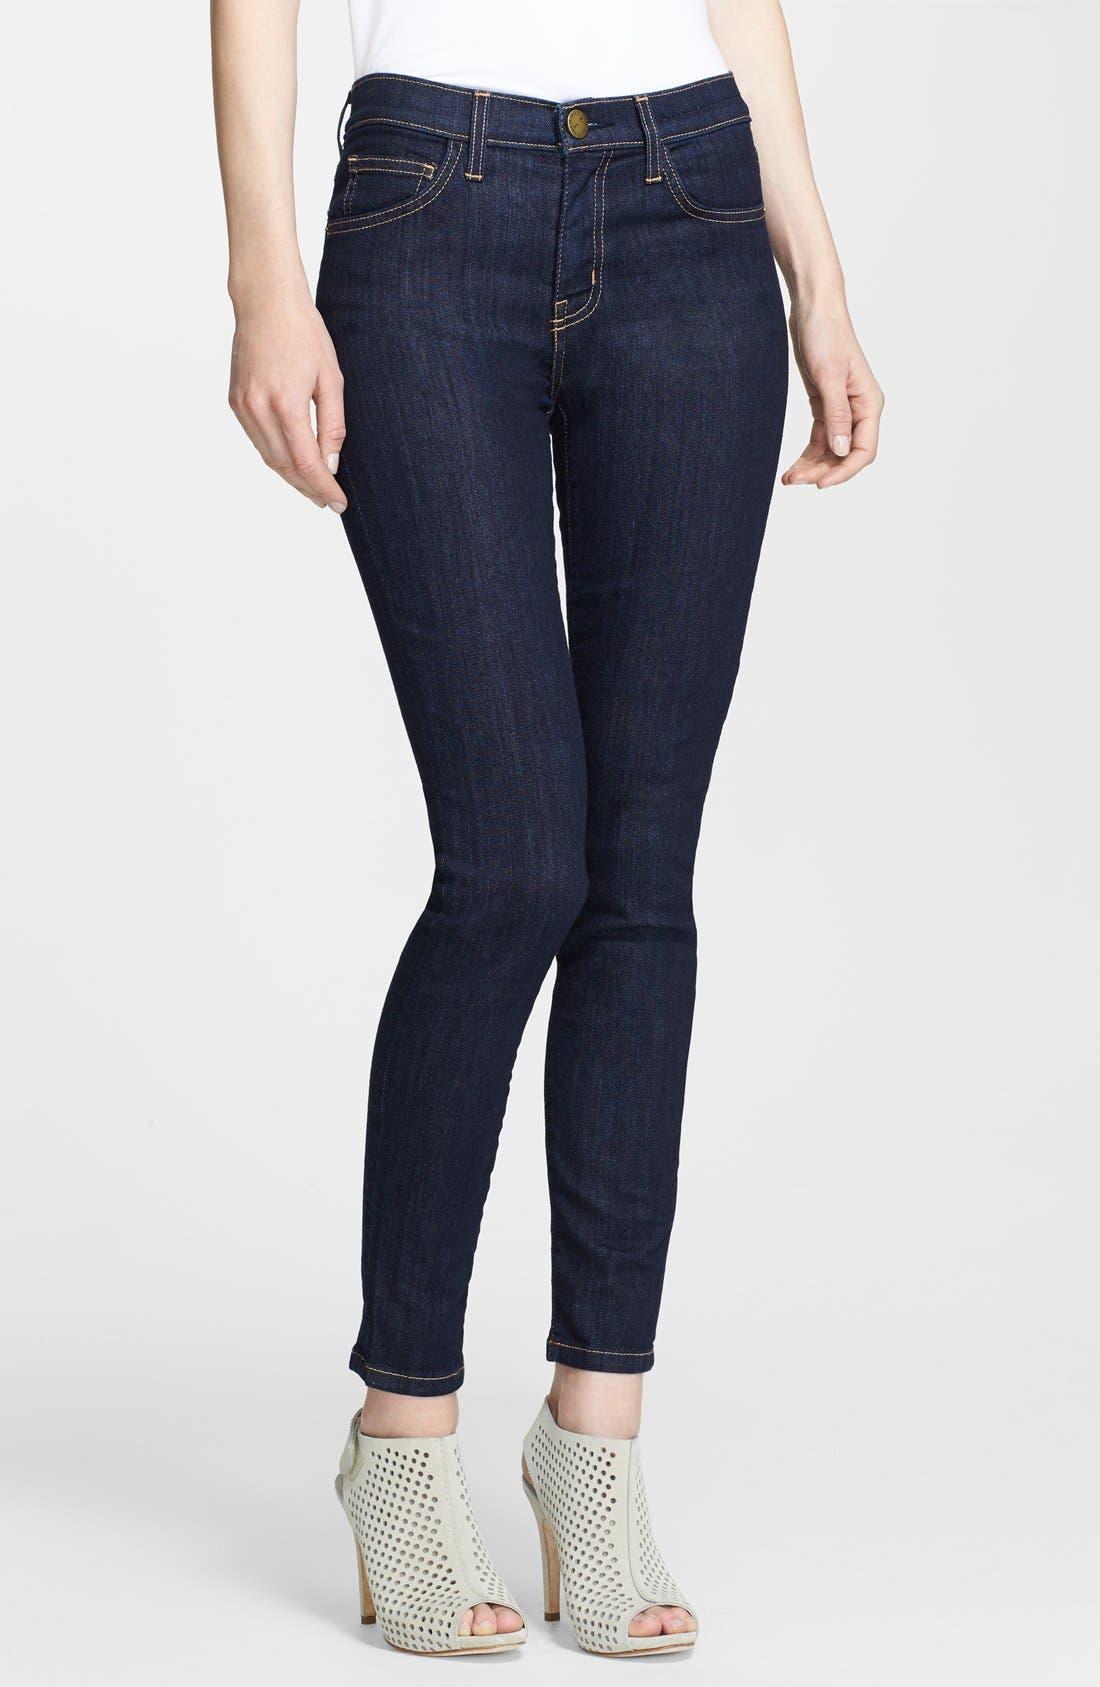 Alternate Image 1 Selected - Current/Elliott High Waist Skinny Ankle Jeans (Rinse)